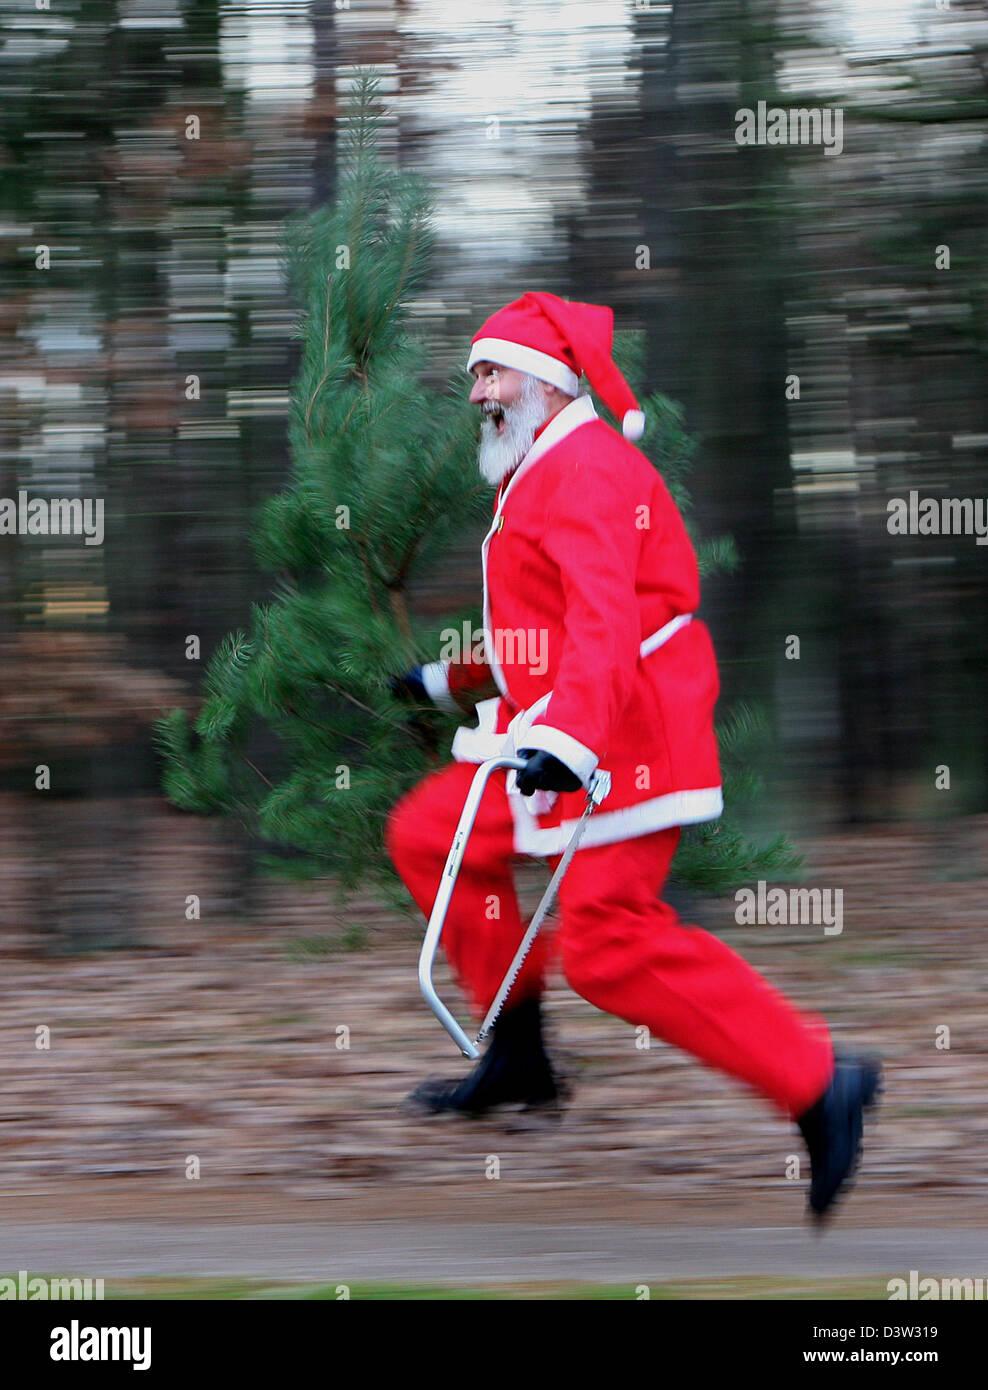 Tour De France 2006 Stock Photos Images Copyright Bicycledesignercom Dressed As Santa Claus German Bicycle Designer Didi Senft Runs With A Pine Tree Aka Christmas